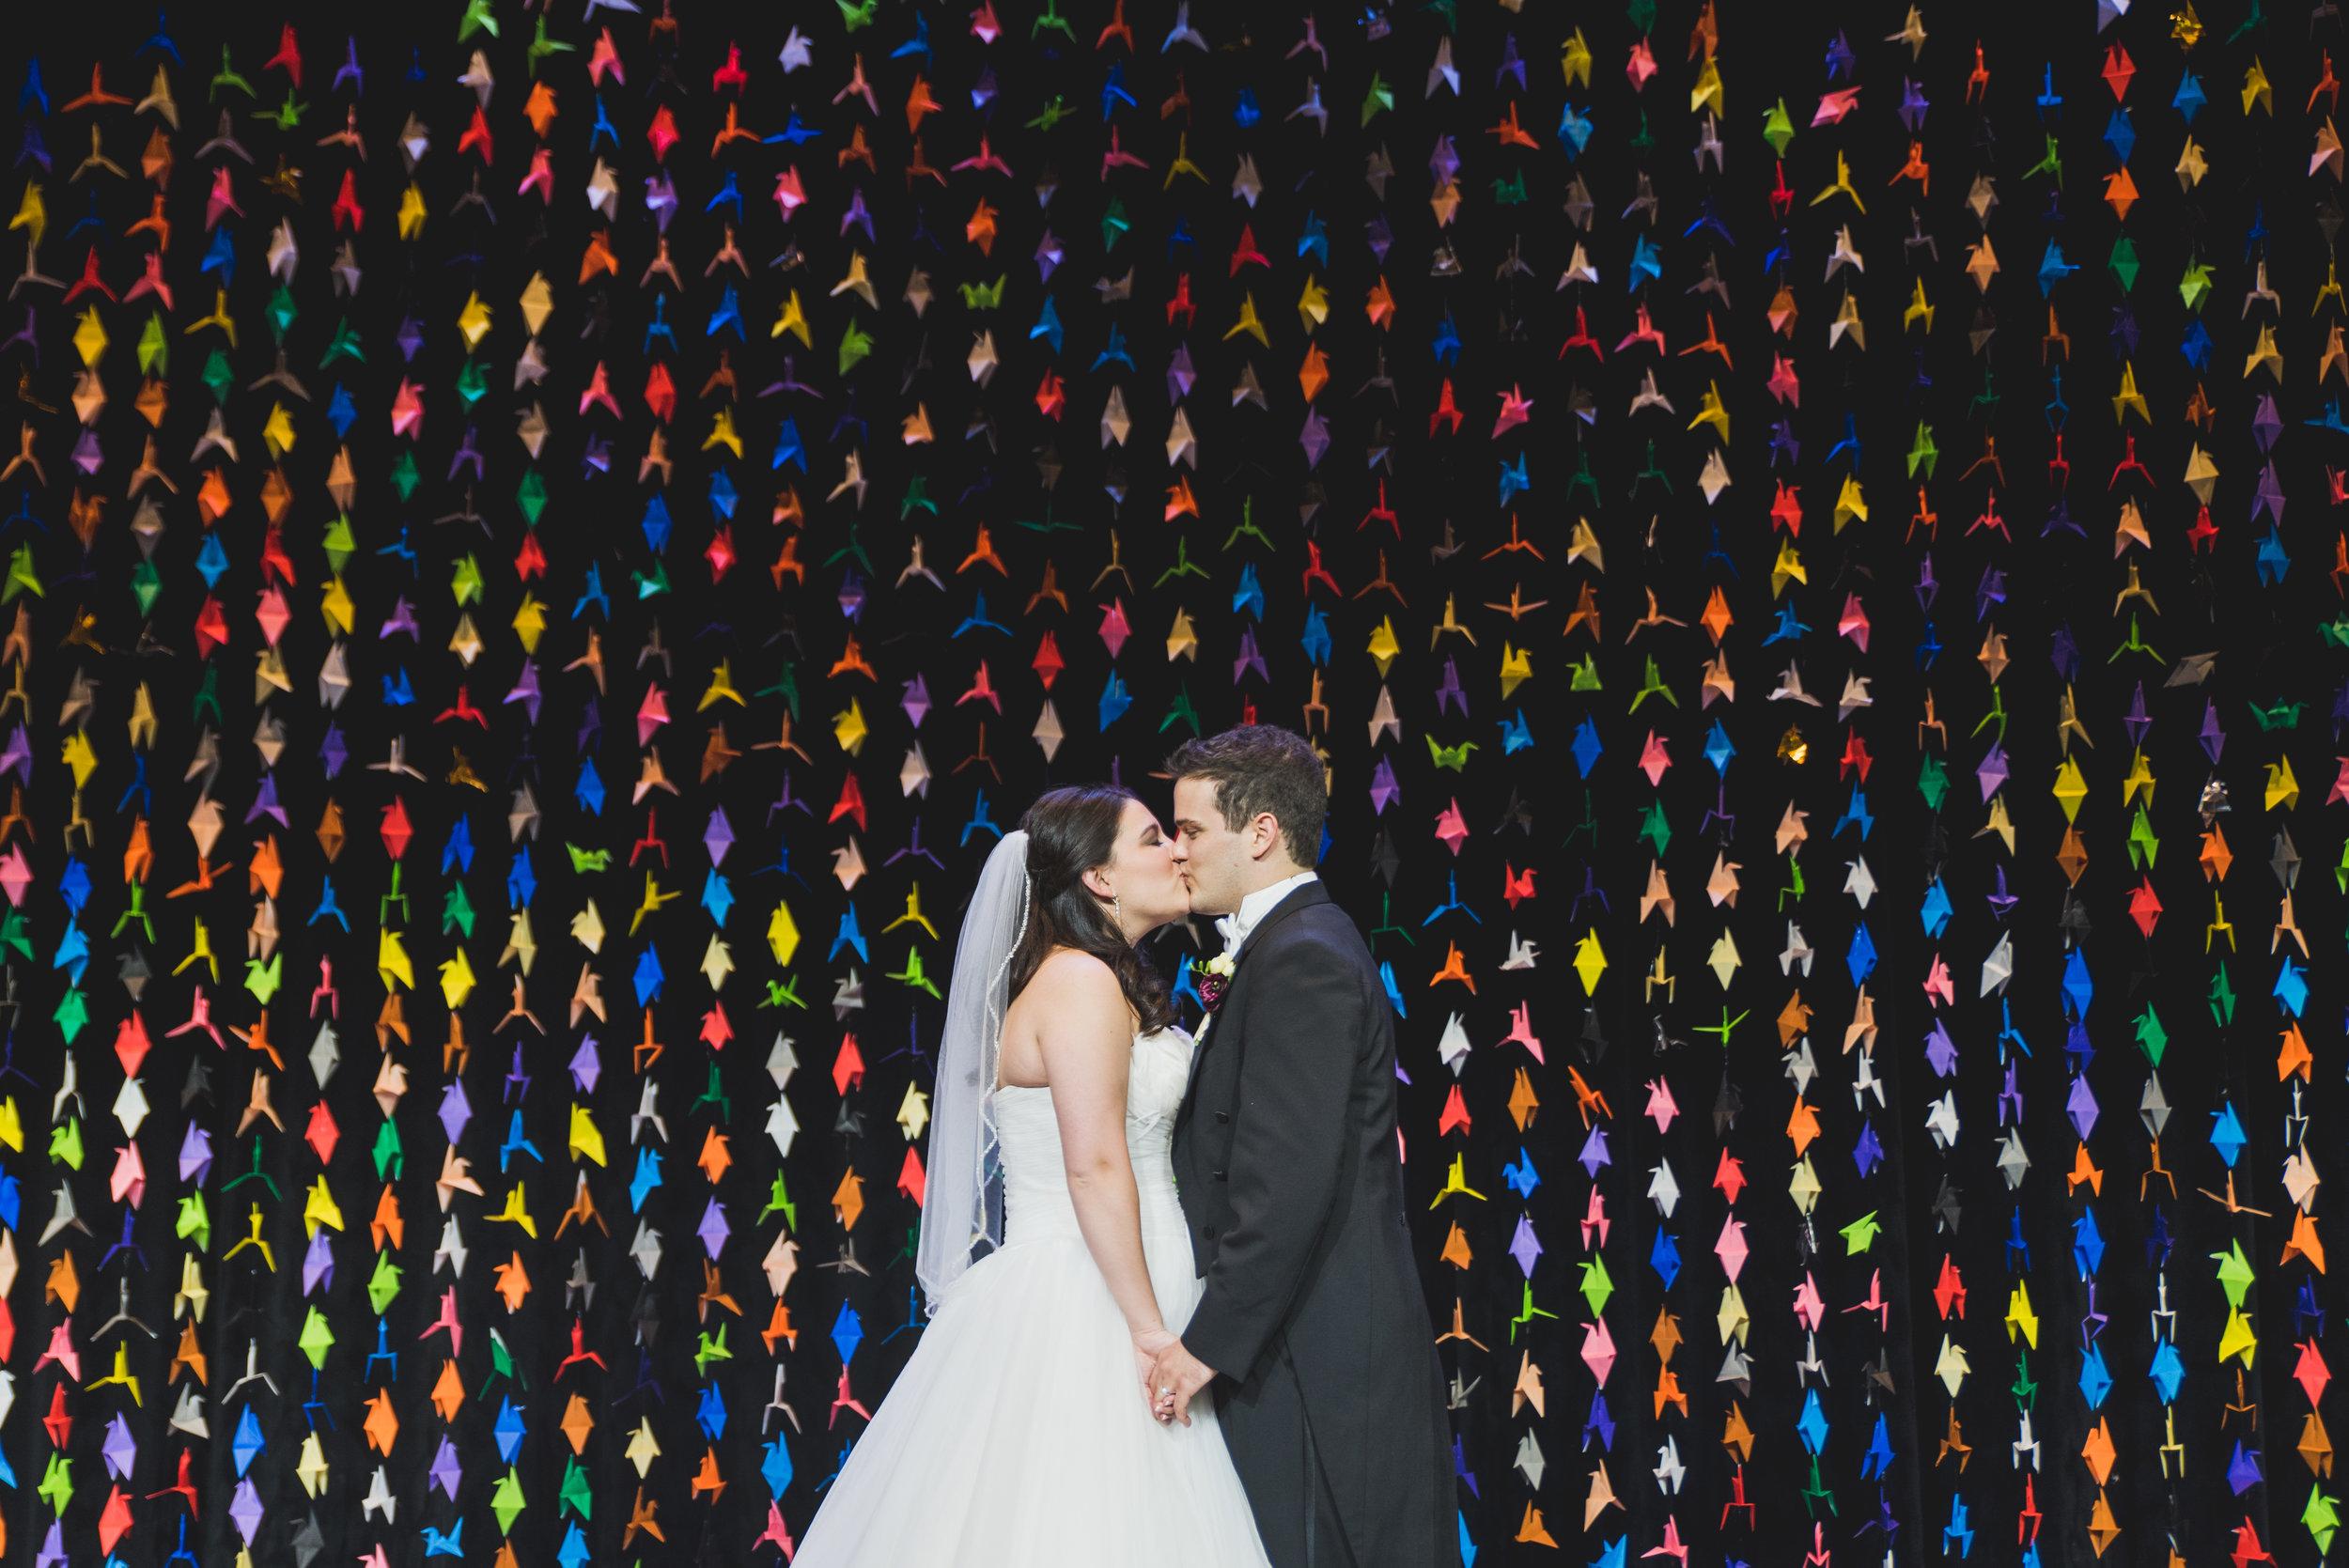 Nashville-Wedding-Photographer-Favorites58.jpg